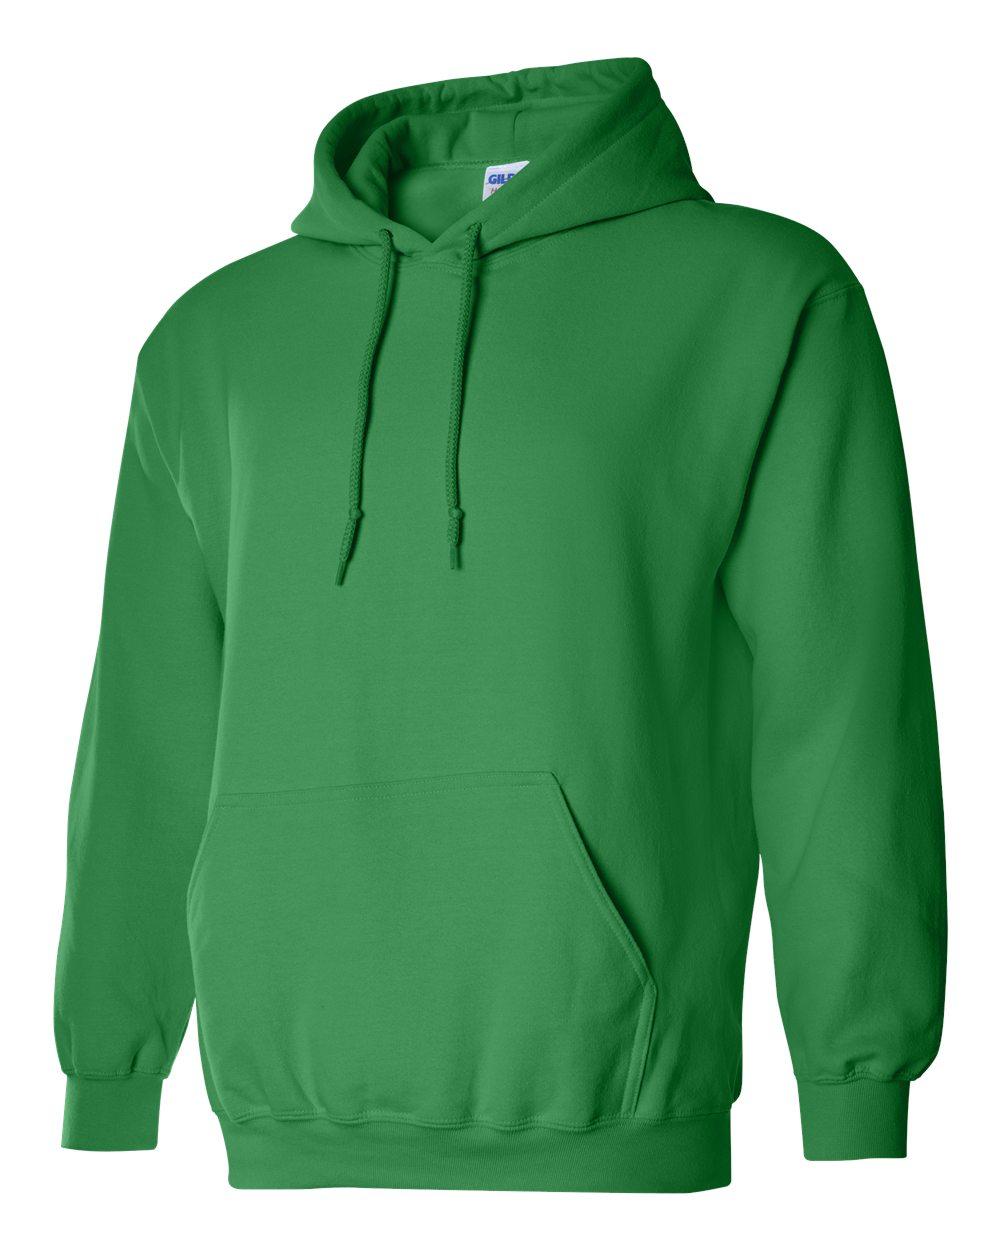 Gildan Heavy Blend Hooded Sweatshirt GI18500 Irish Green